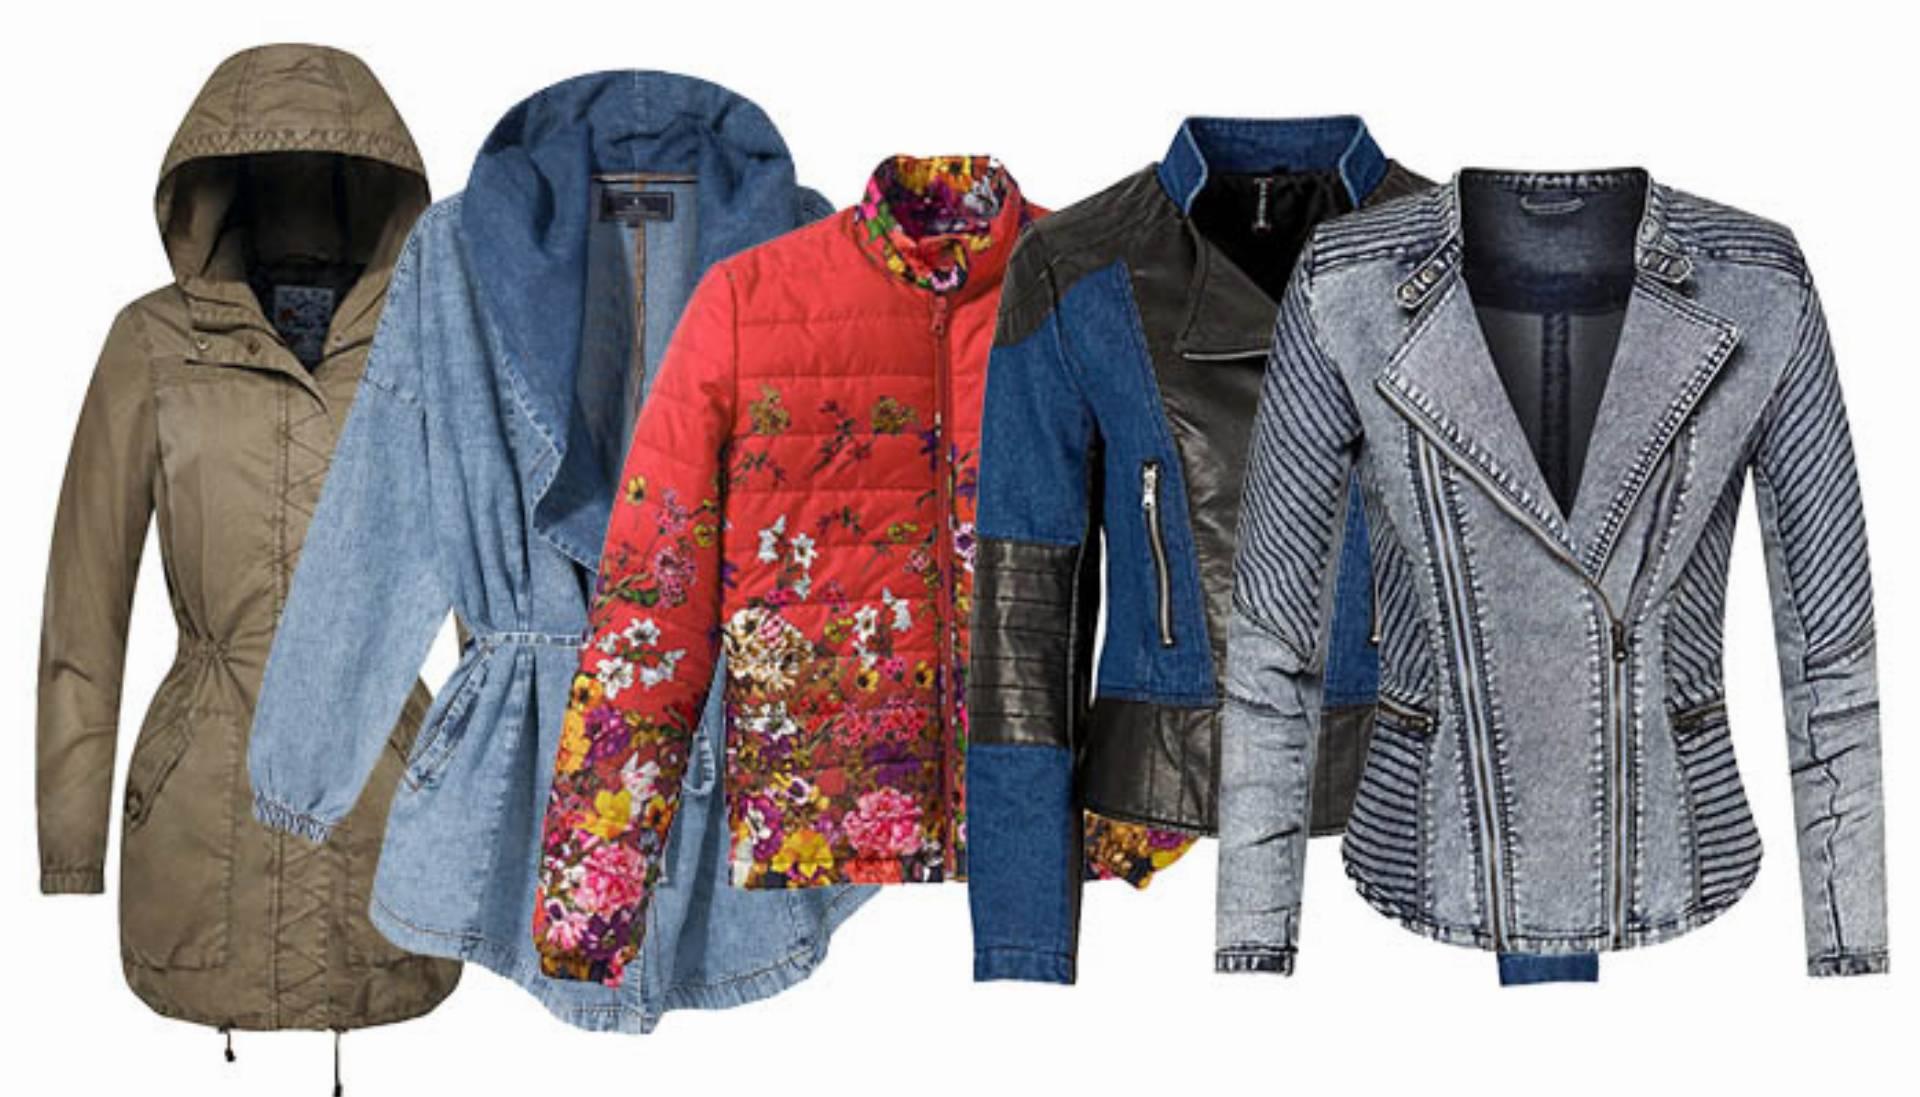 modne kurtki wiosna 2015